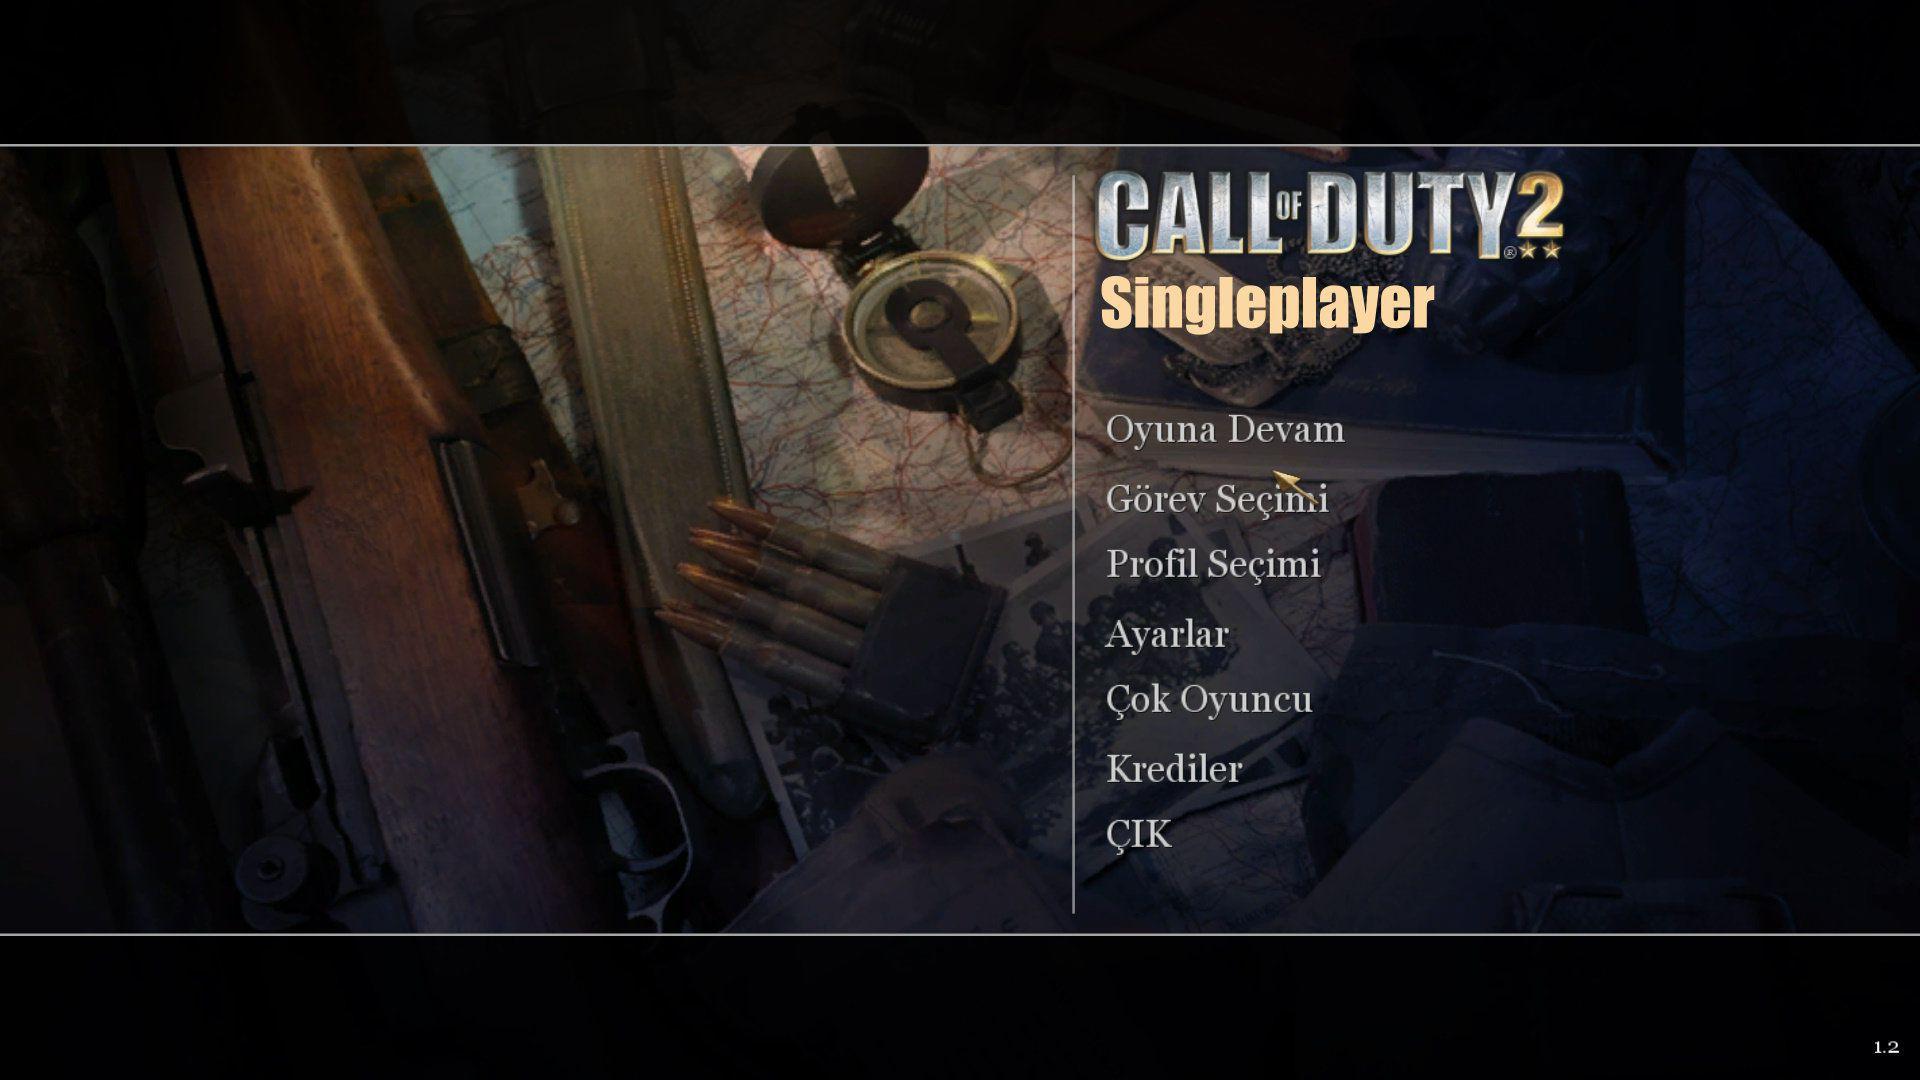 Call of Duty 2 Türkçe Yama Singleplayer Ana Menü